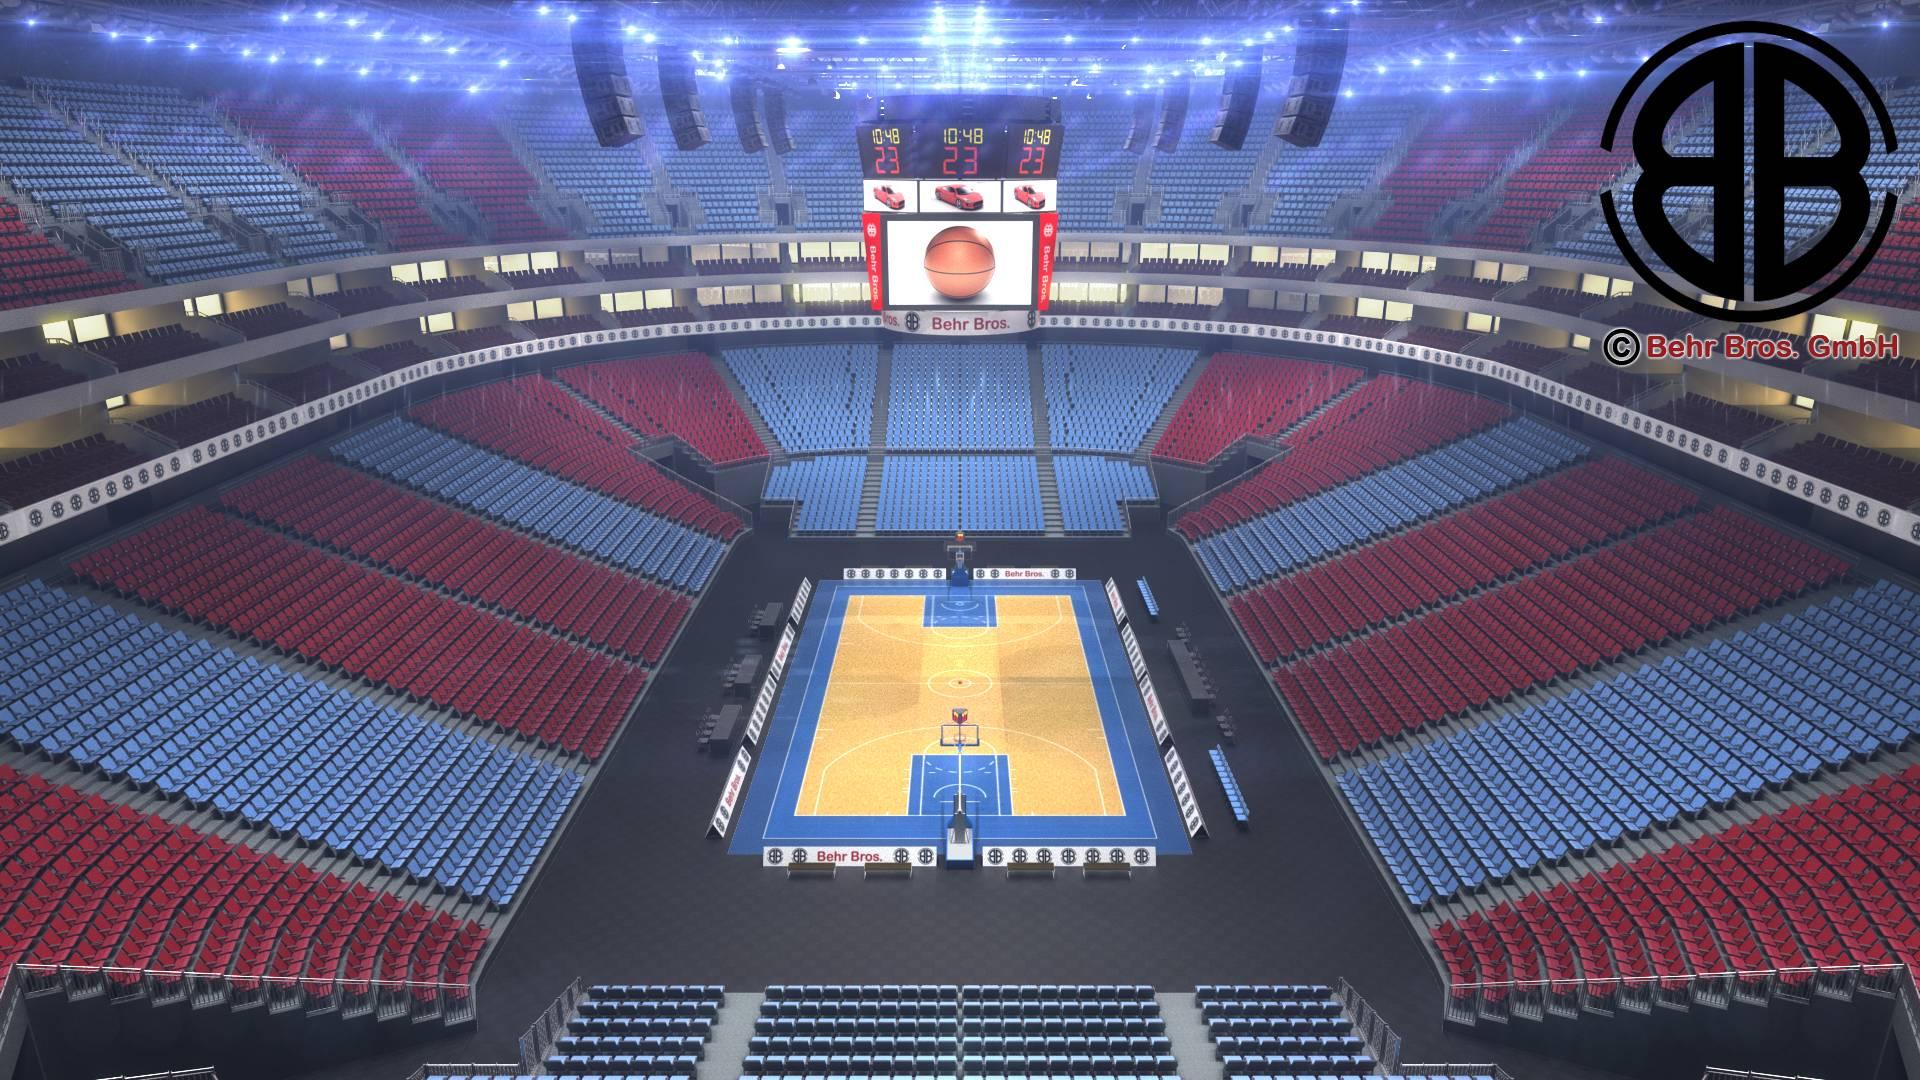 Basketball Arena V2 3d model 3ds max fbx c4d lwo lws lw ma mb obj 222363